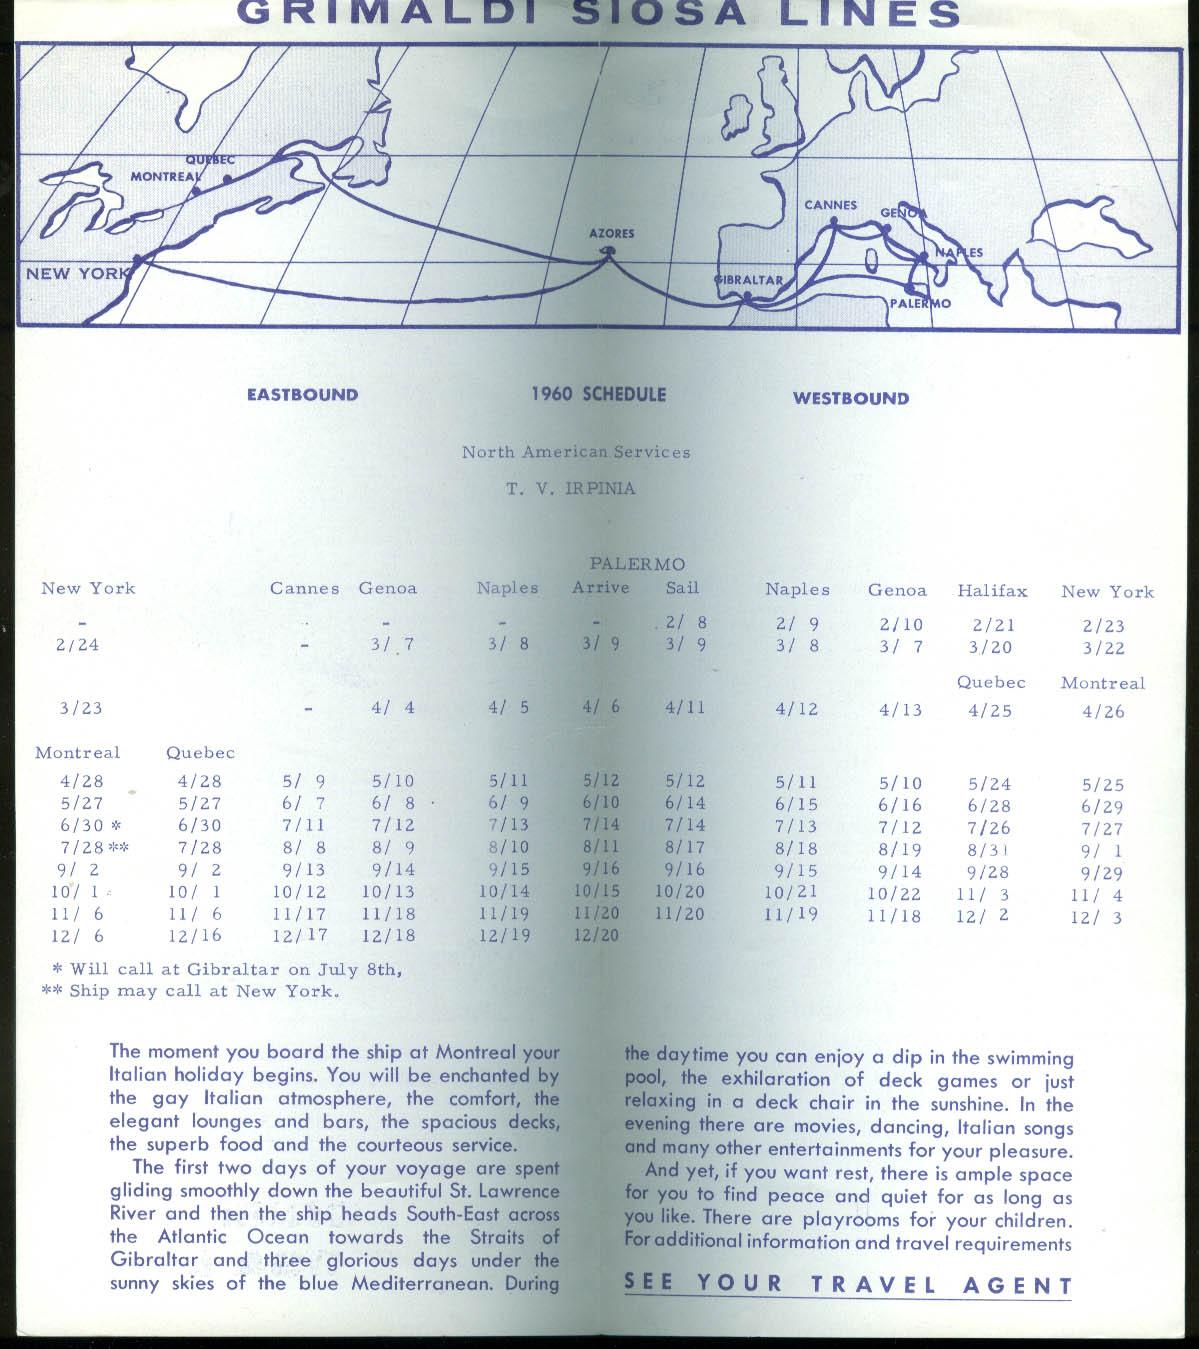 Grimaldi Siosa Lines T V Irpina ocean liner schedule 1960 N America-Italy